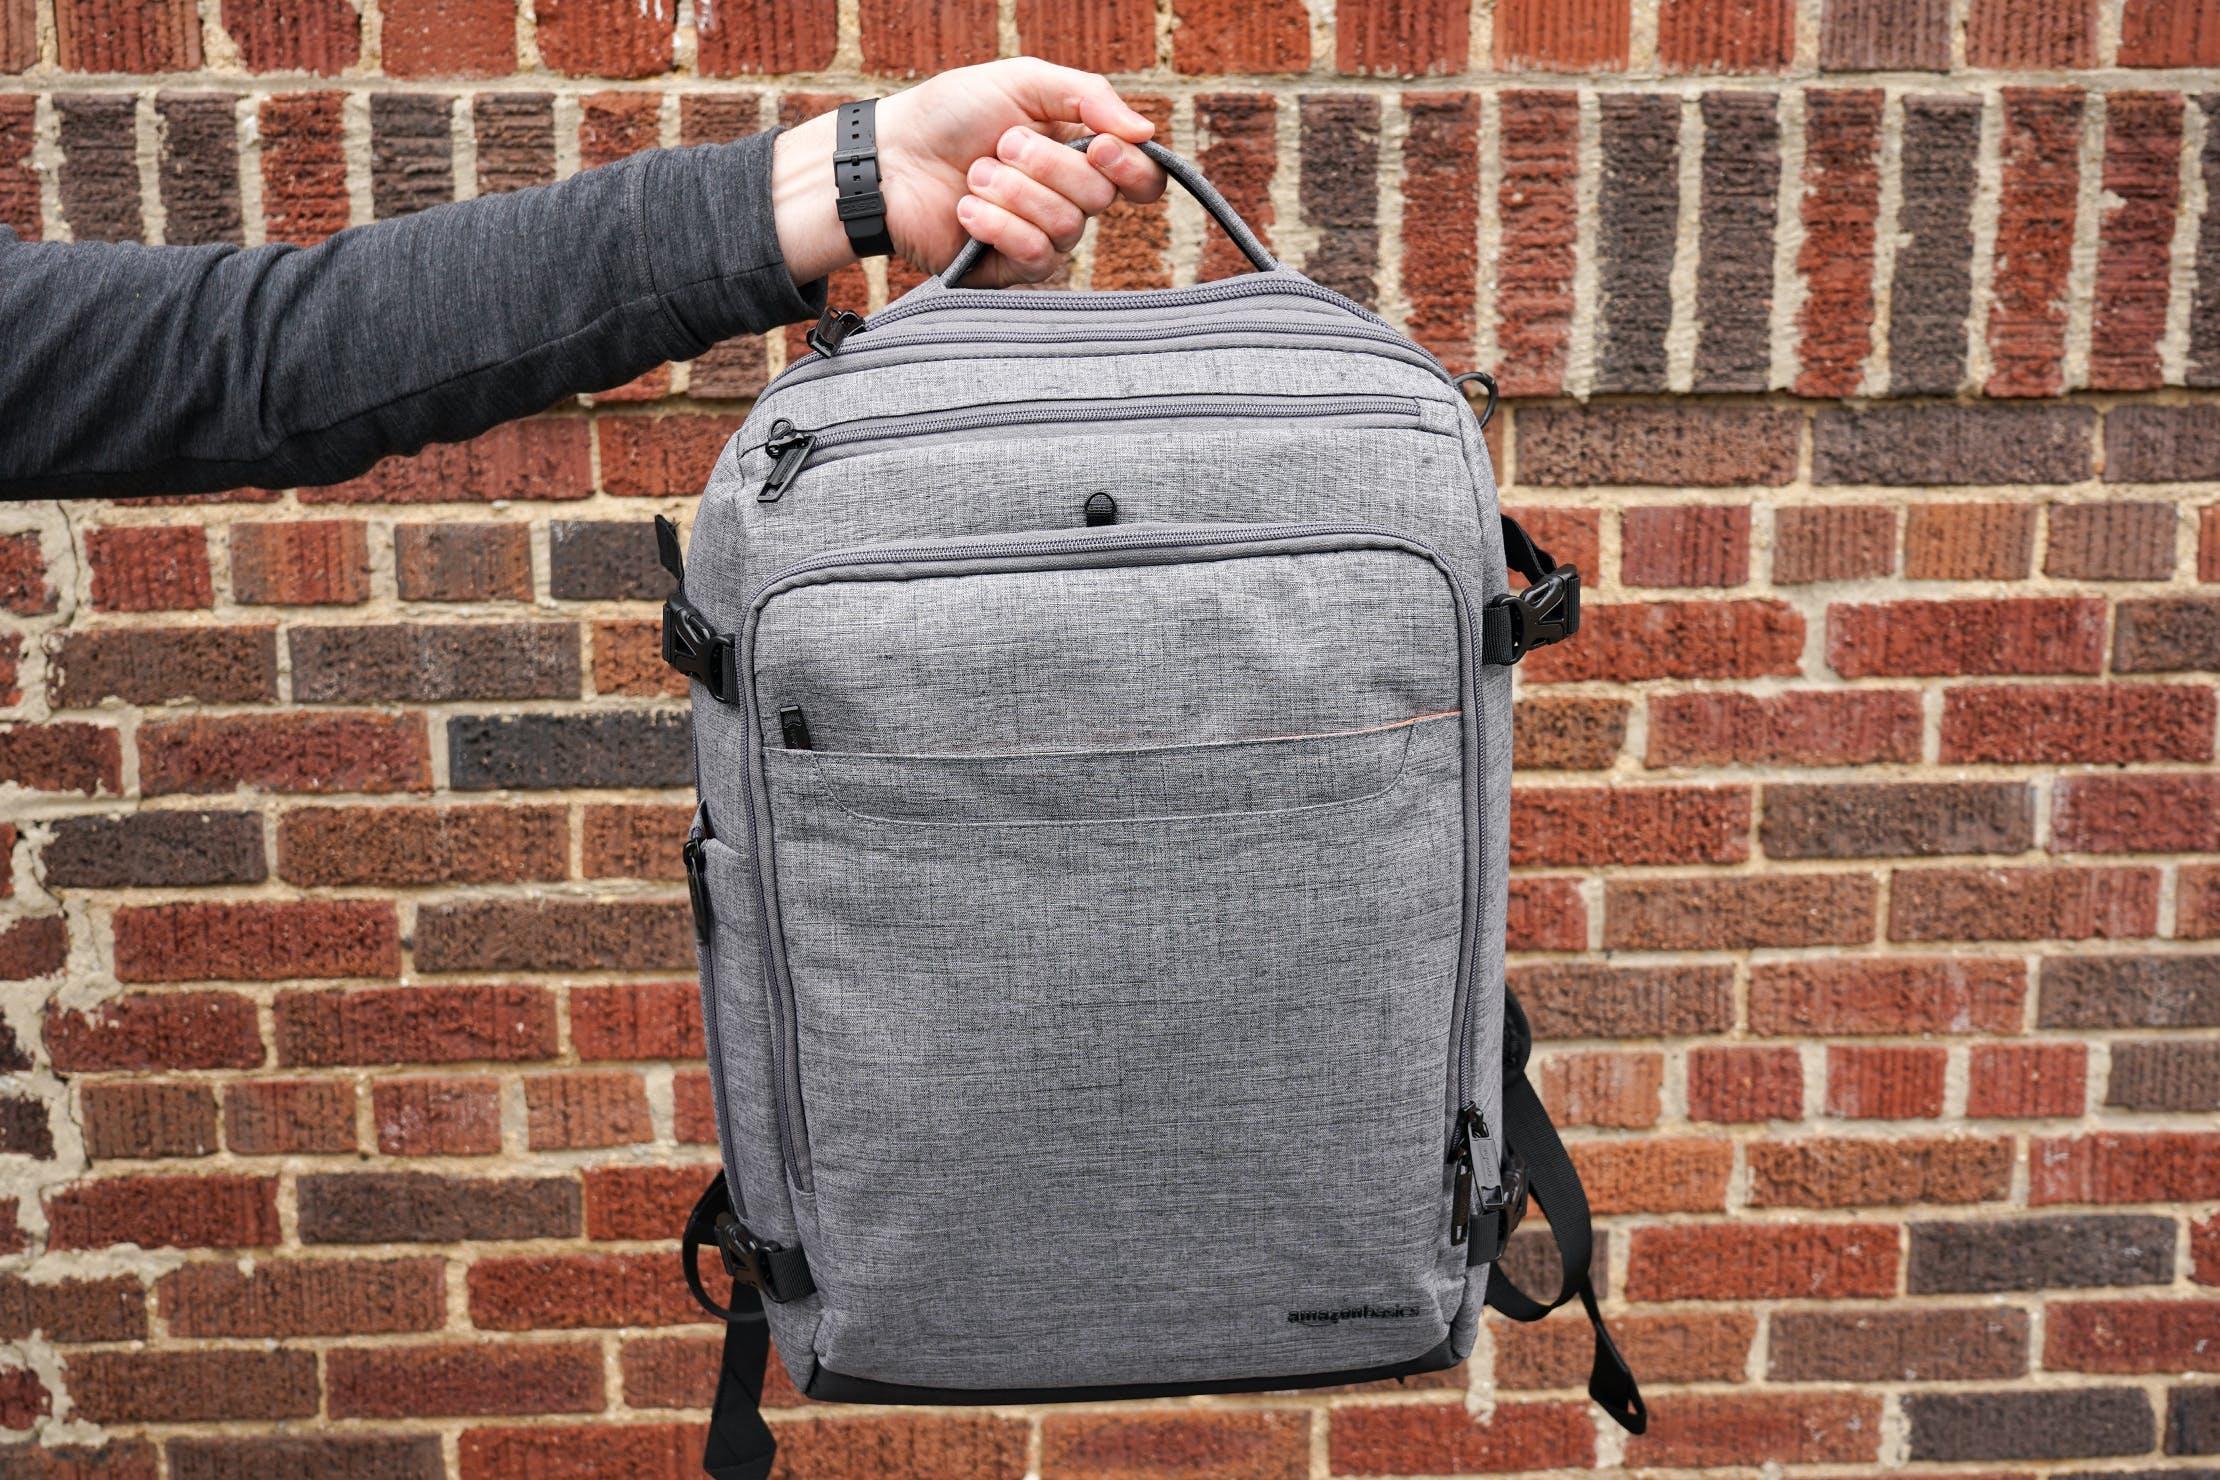 AmazonBasics Slim Travel Backpack Weekender Quick Grab Handle